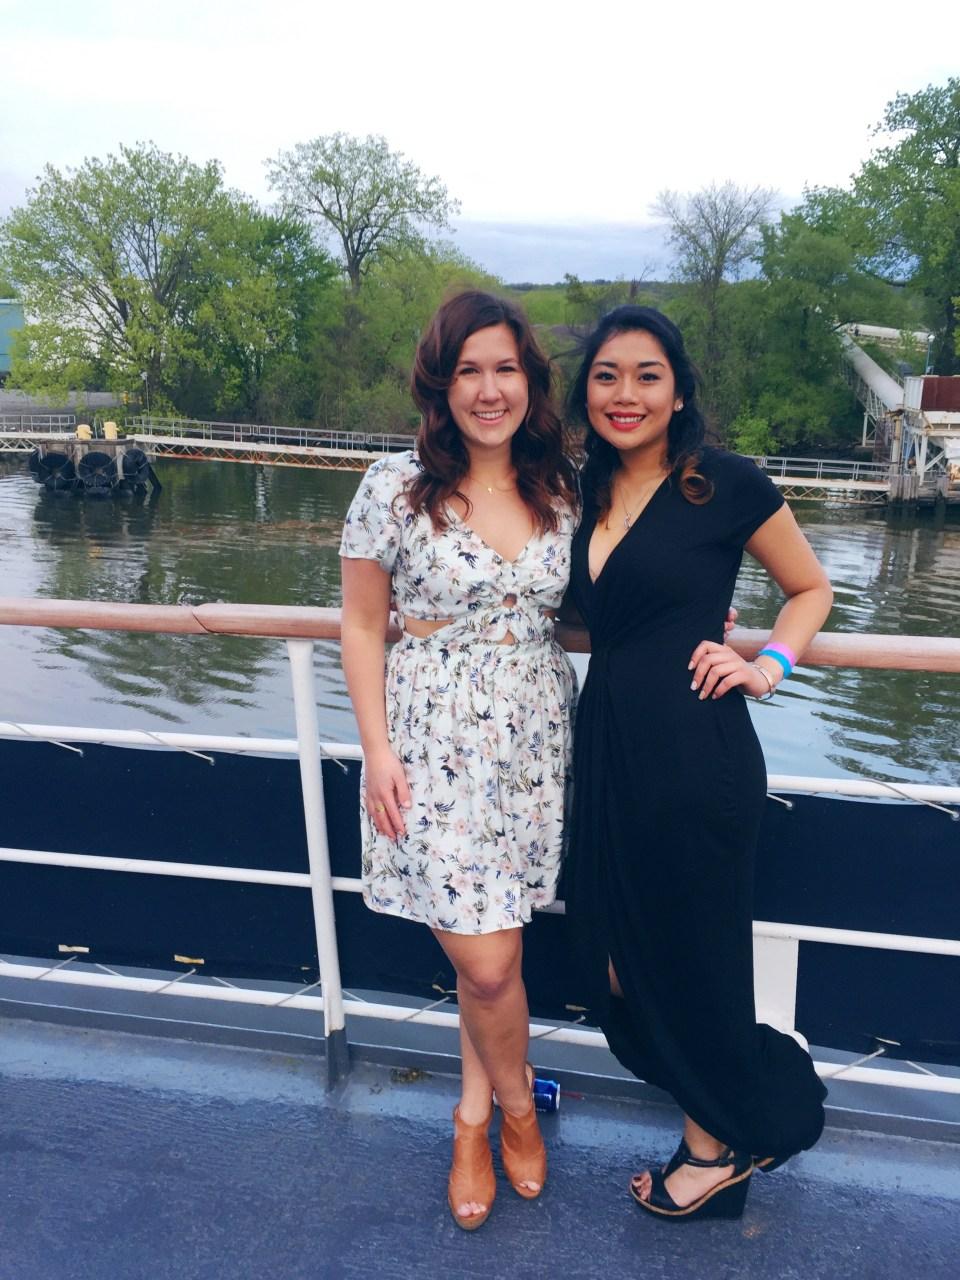 Boat Cruise Dress